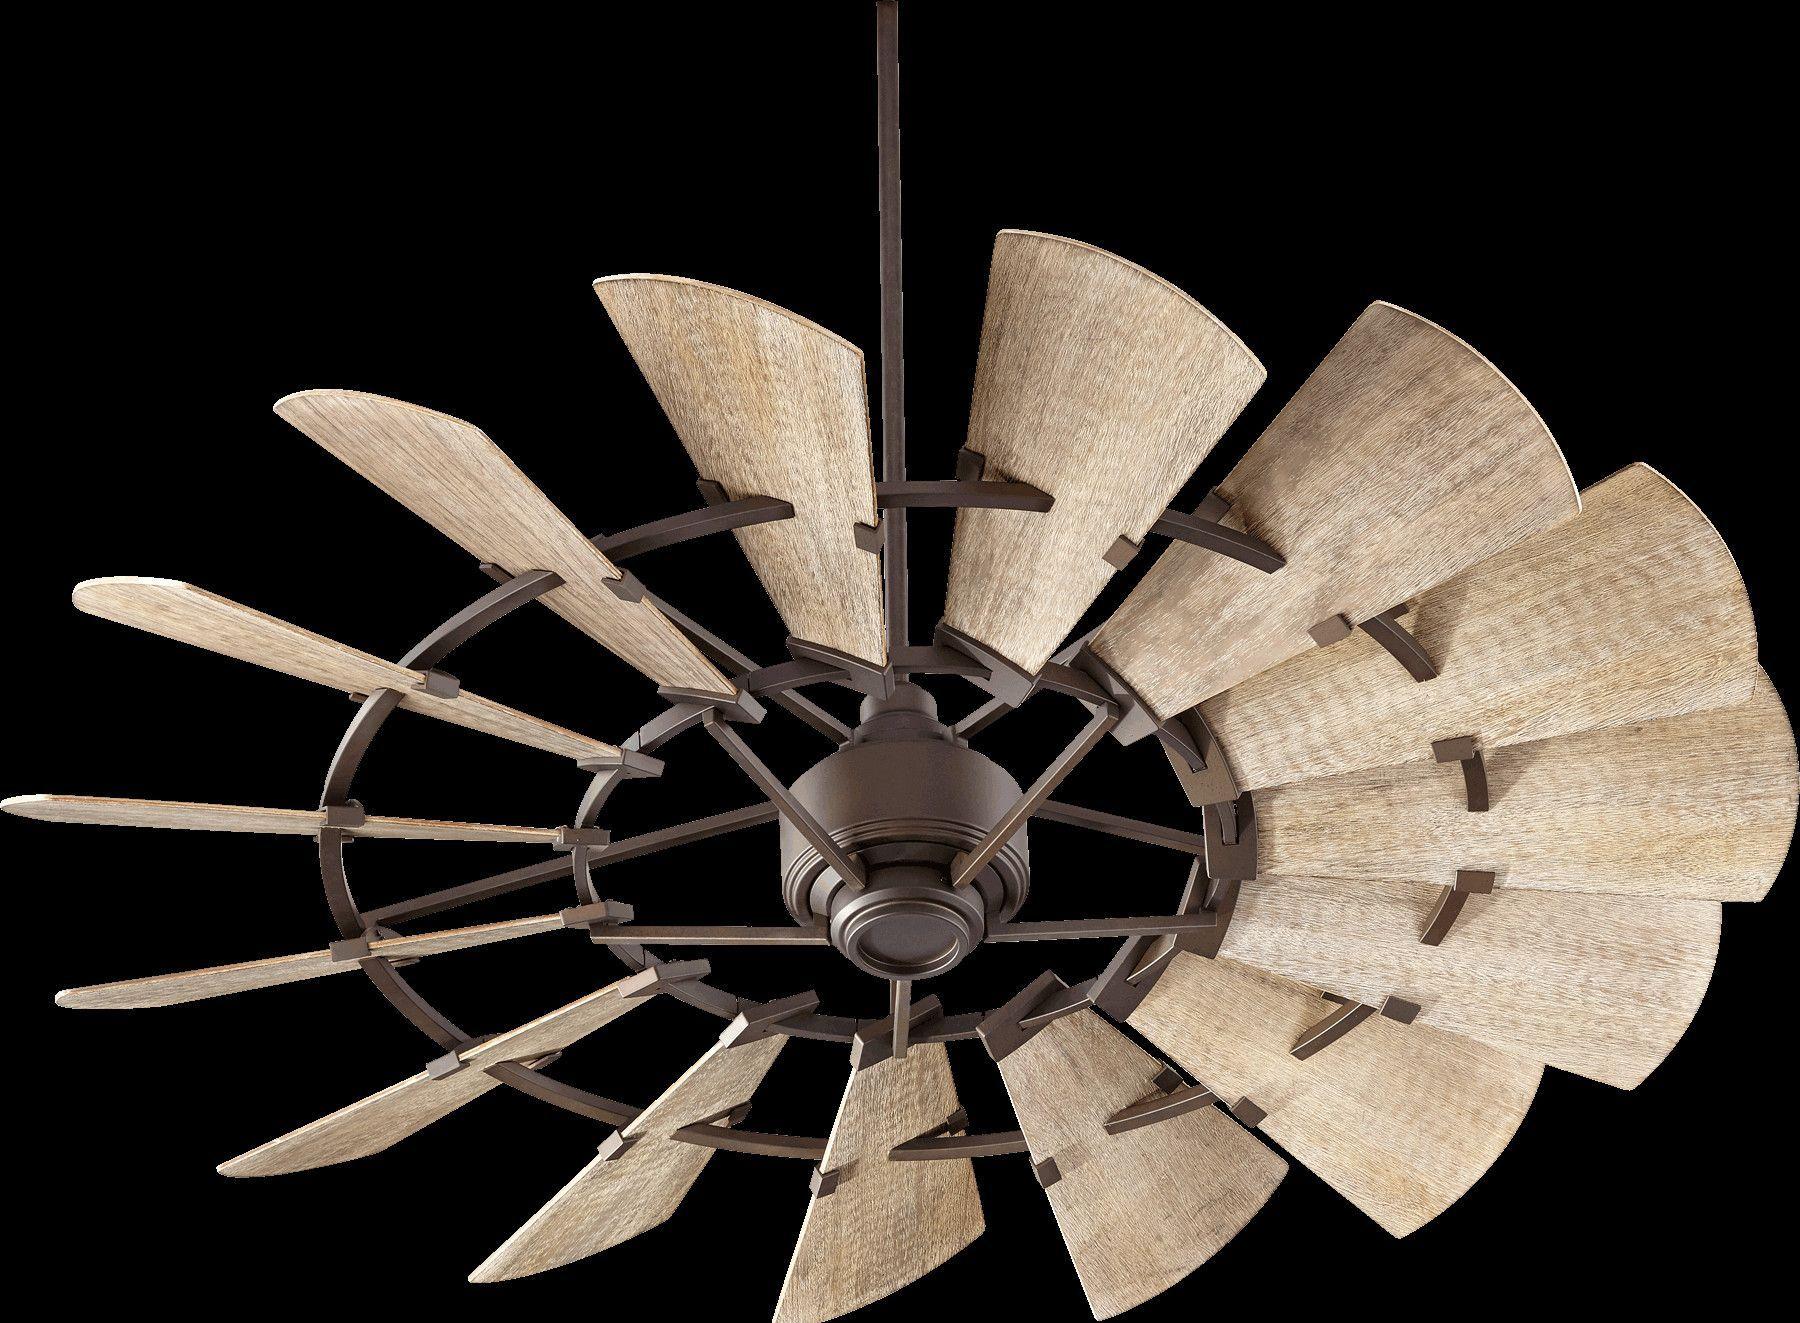 60 Quot Windmill 15 Blade Ceiling Fan Lighting Windmill